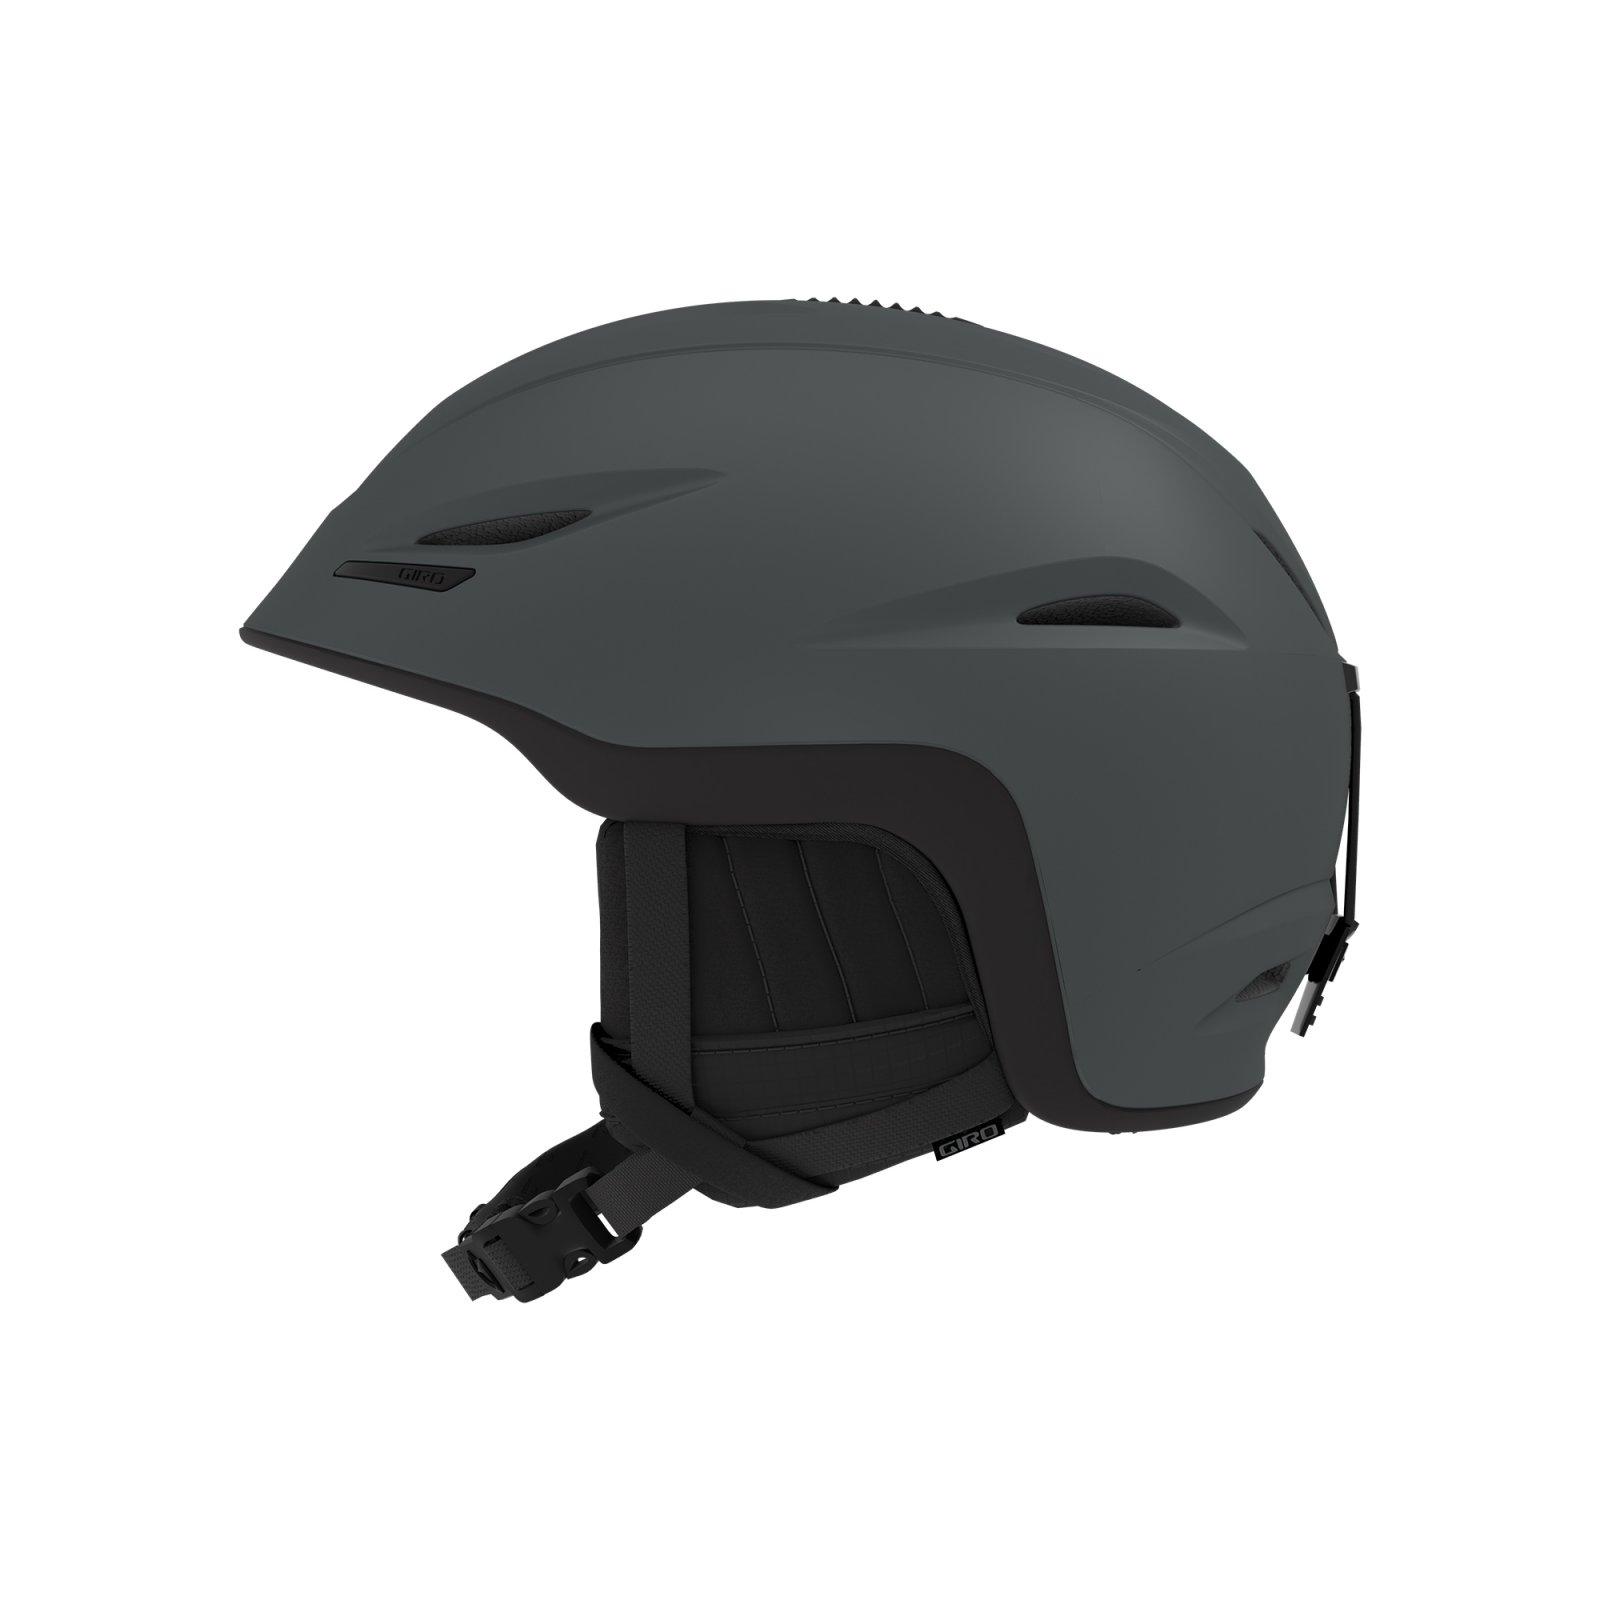 Giro Union MIPS Helmet - Matte Charcoal